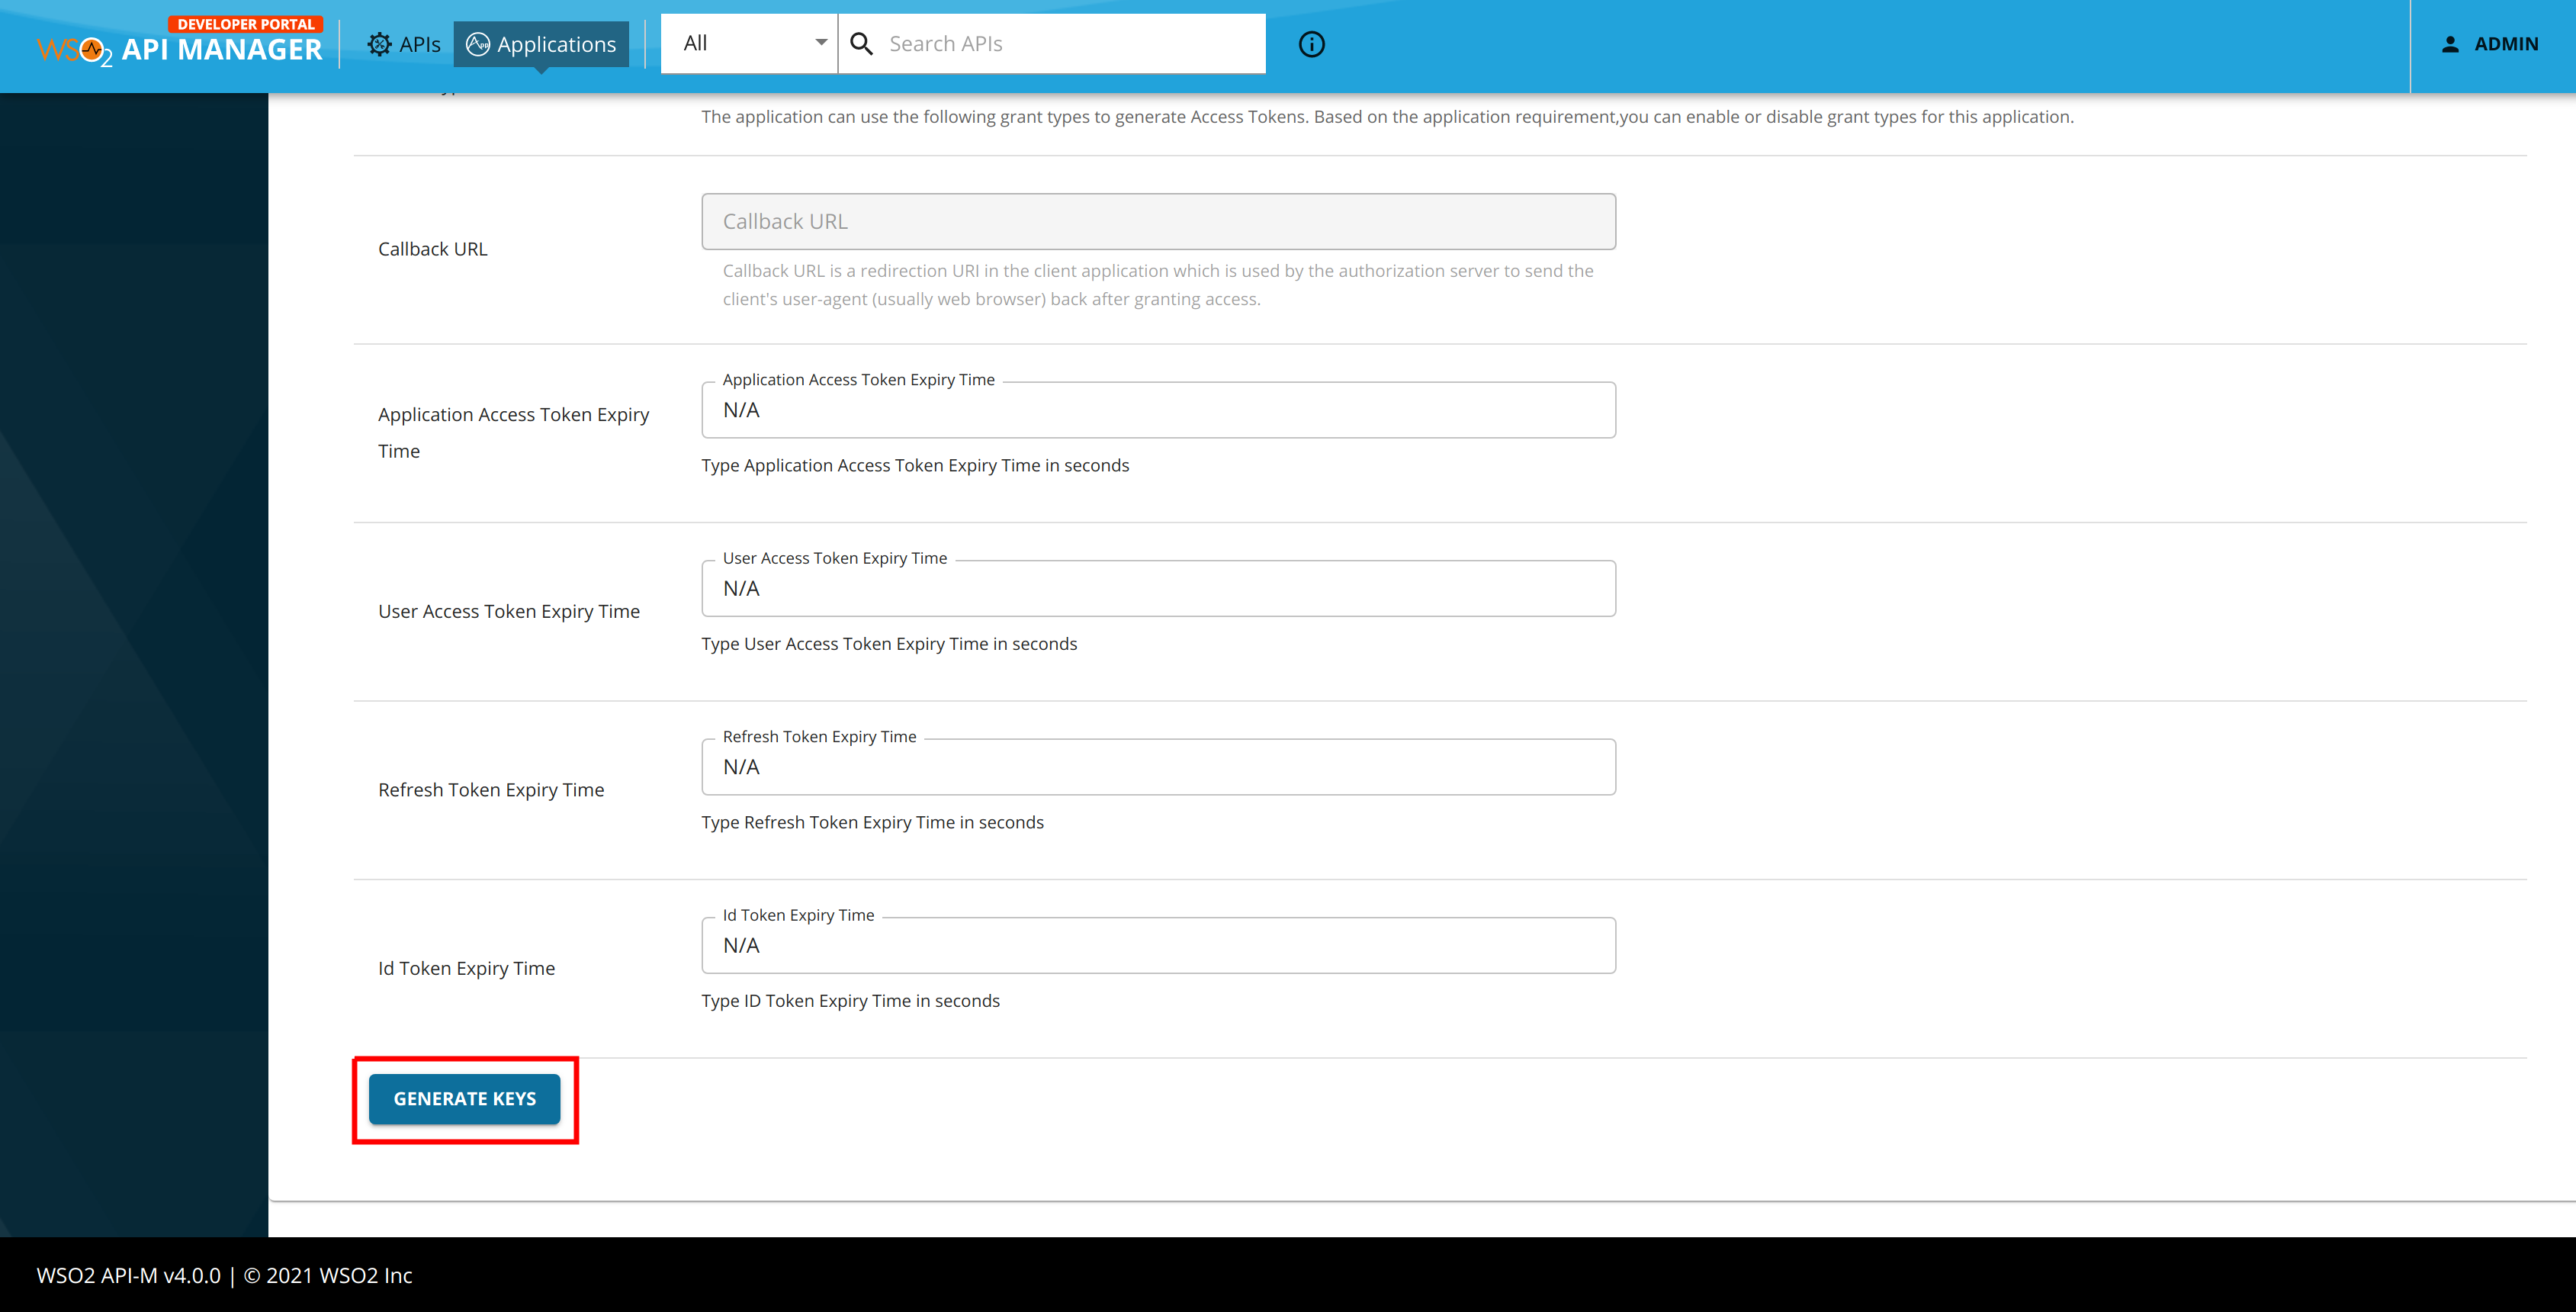 Generate Phone Verification OAuth Key